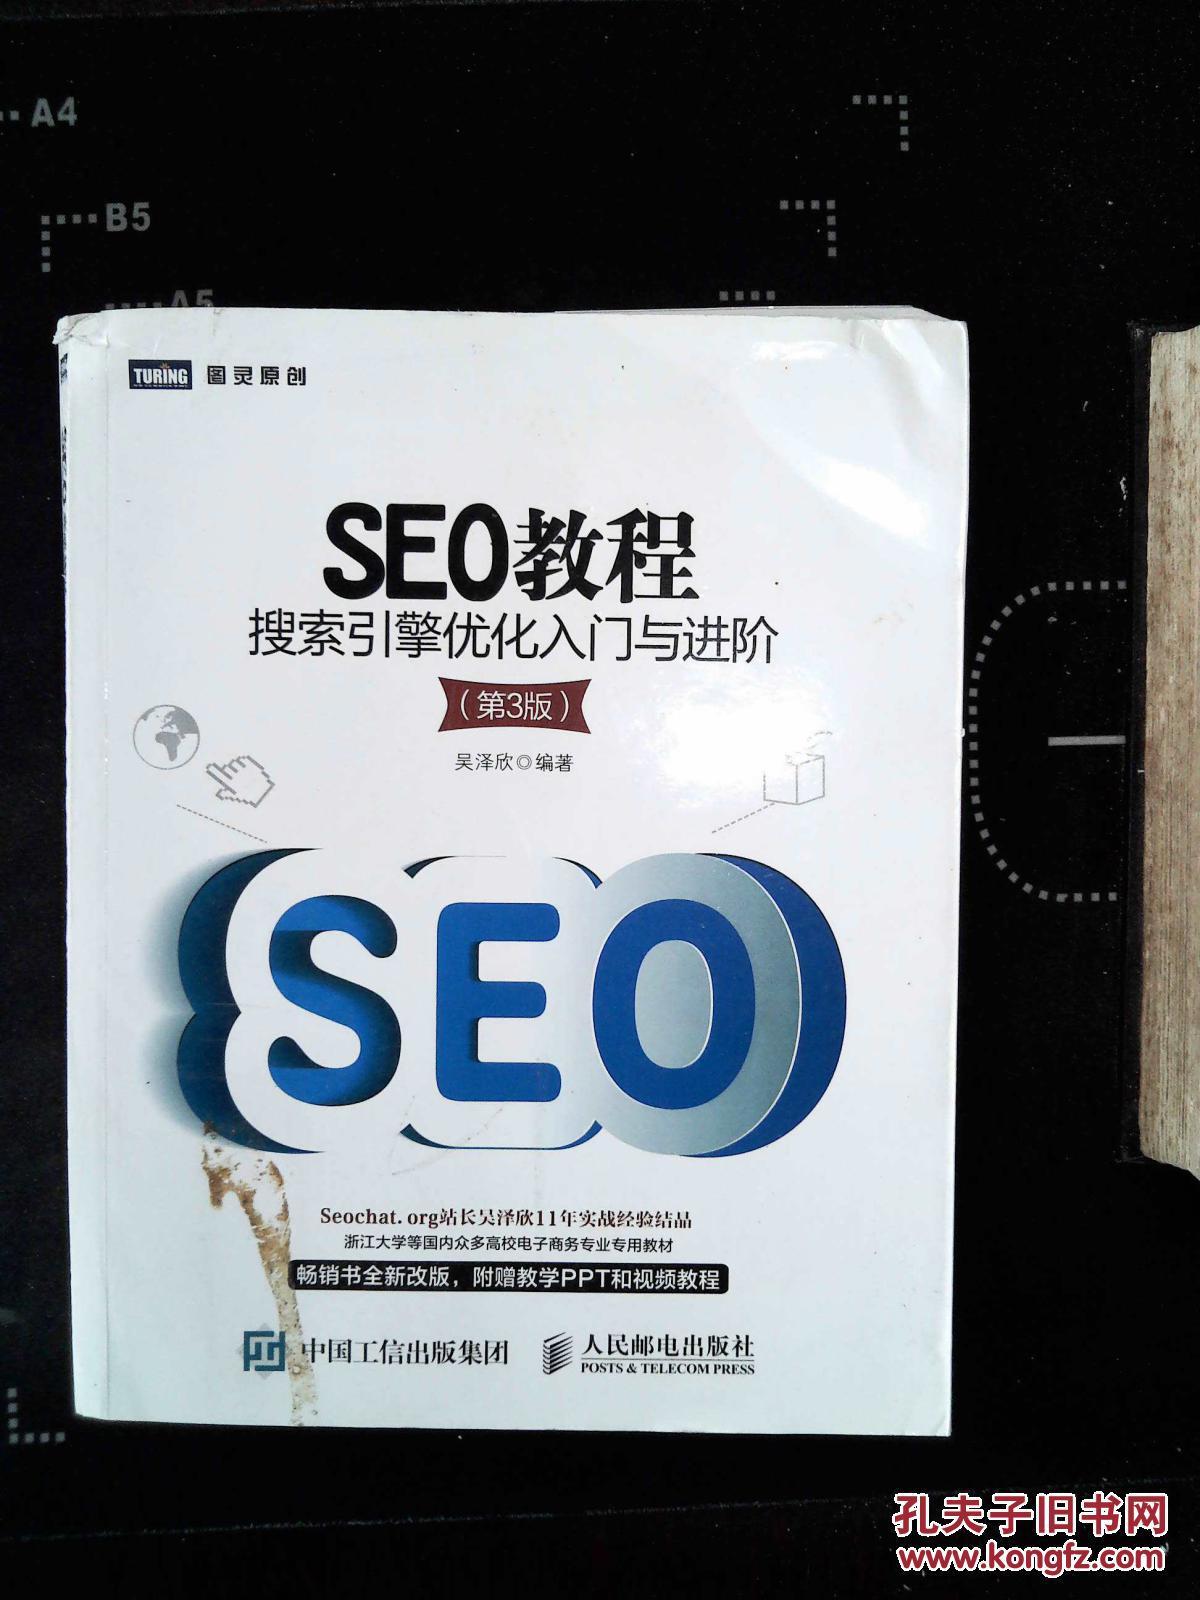 seo教程搜索引擎优化入门与进阶_seo教程:搜索引擎优化入门与进阶 pdf_seo入门书籍